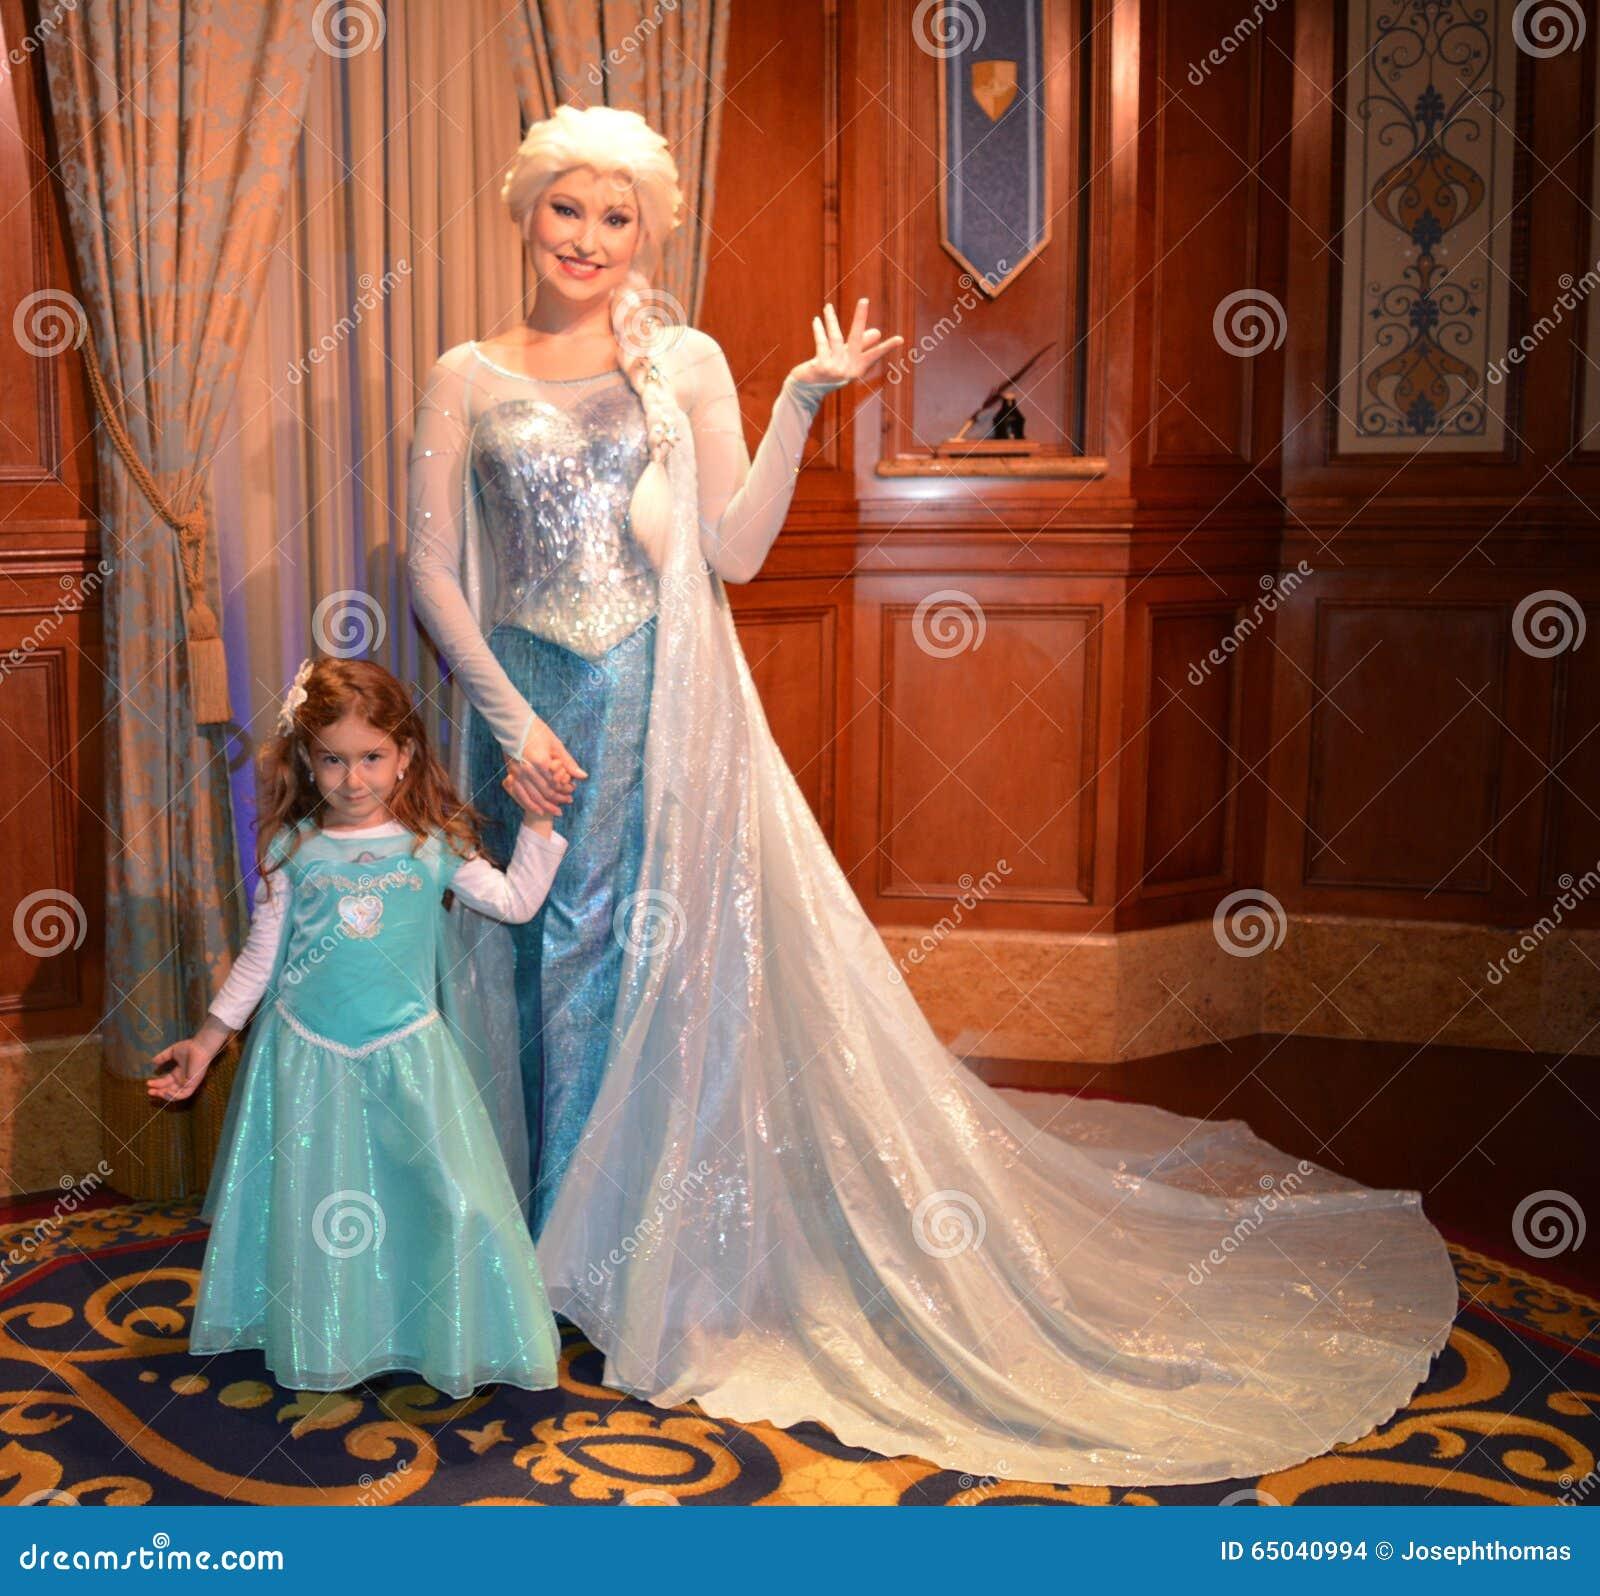 bc4becd99b1f Elsa And Beautiful Girl - Disney Movie Frozen - Magic Kingdom ...